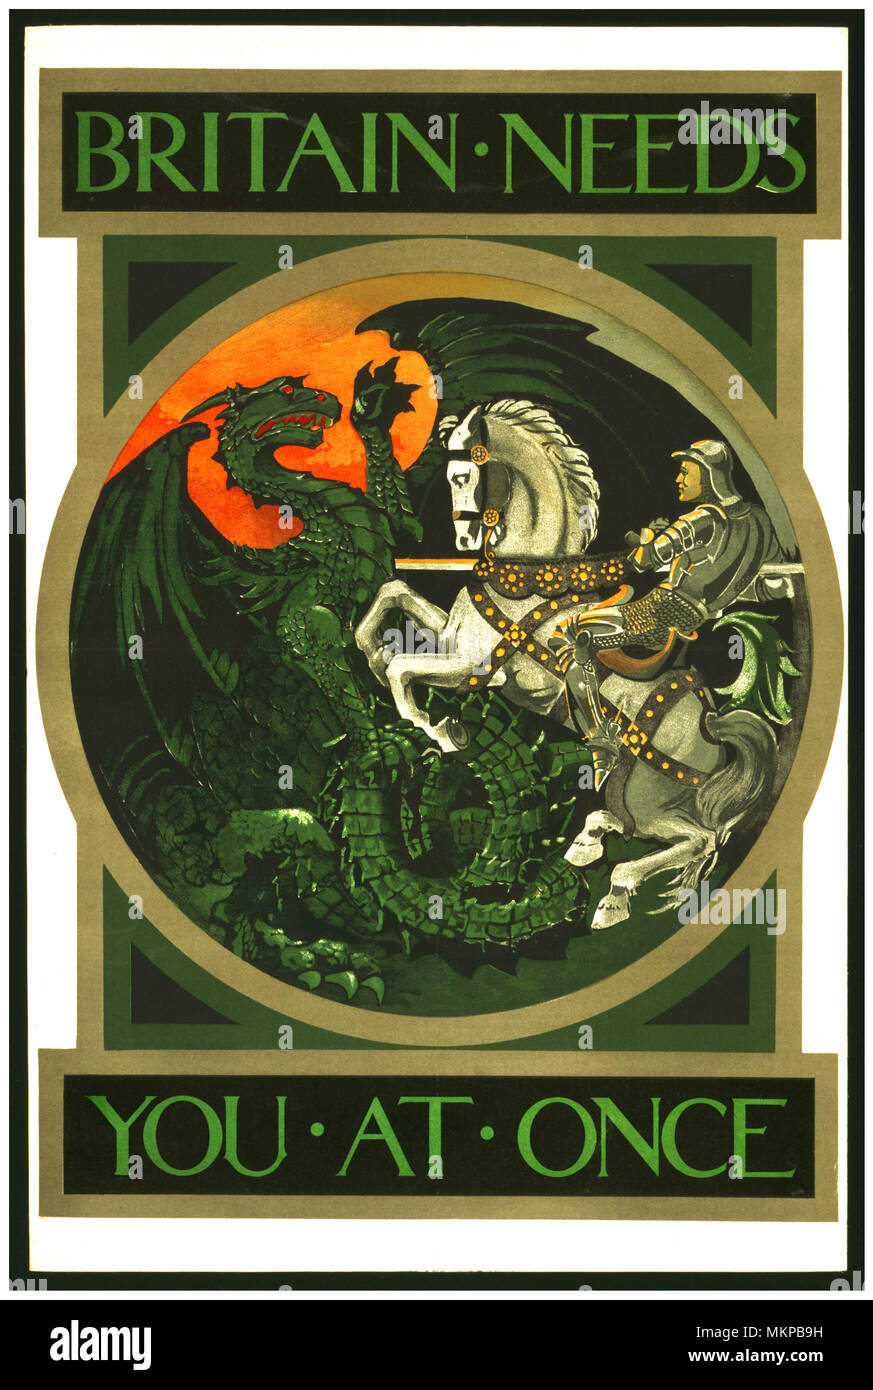 BRITAIN NEEDS YOU AT ONCE  British WW1 Propaganda Poster